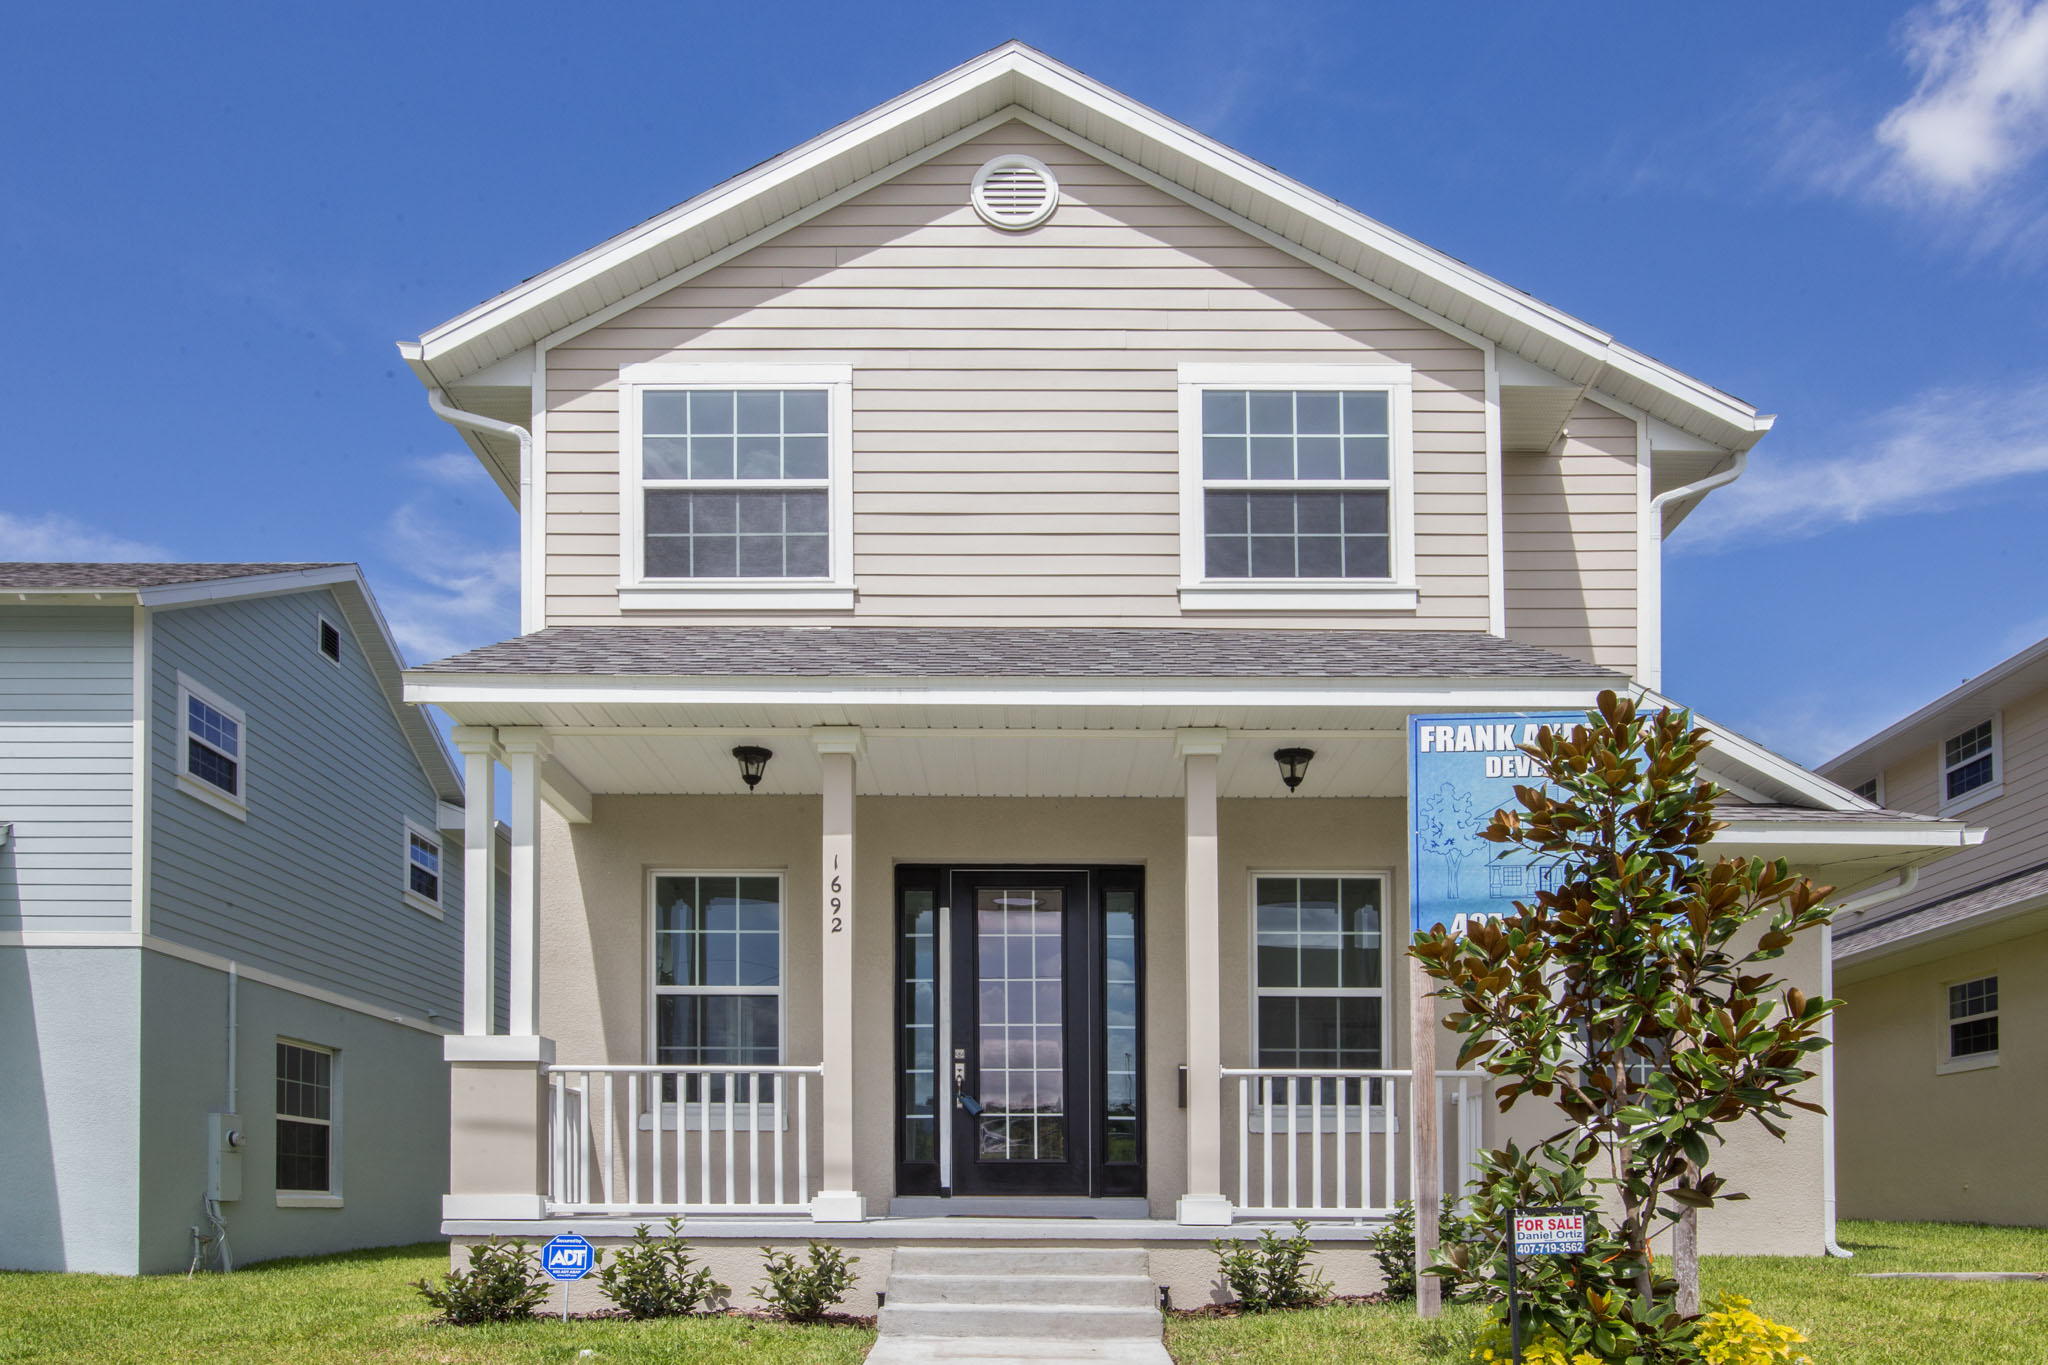 1692 N SHORE DR, ORLANDO, FL 32804